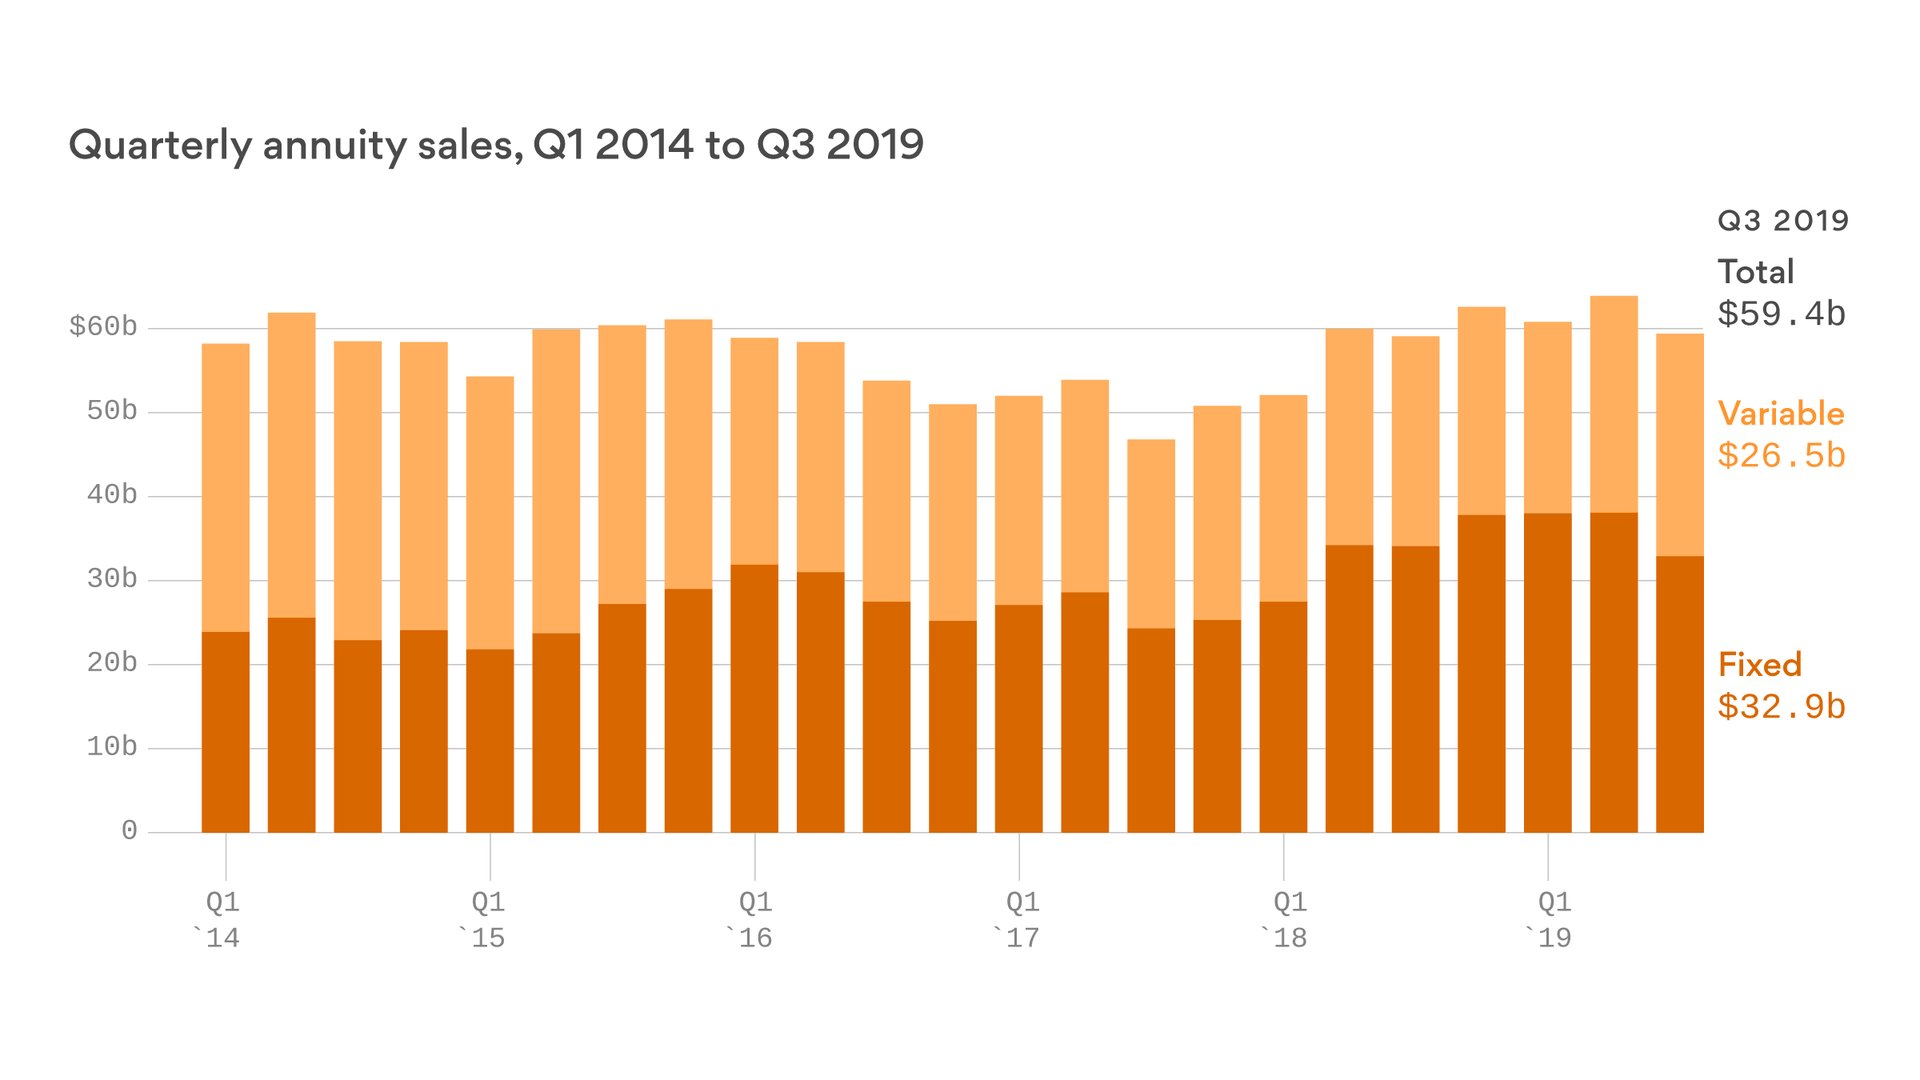 Variable annuities purchases reach three-year high